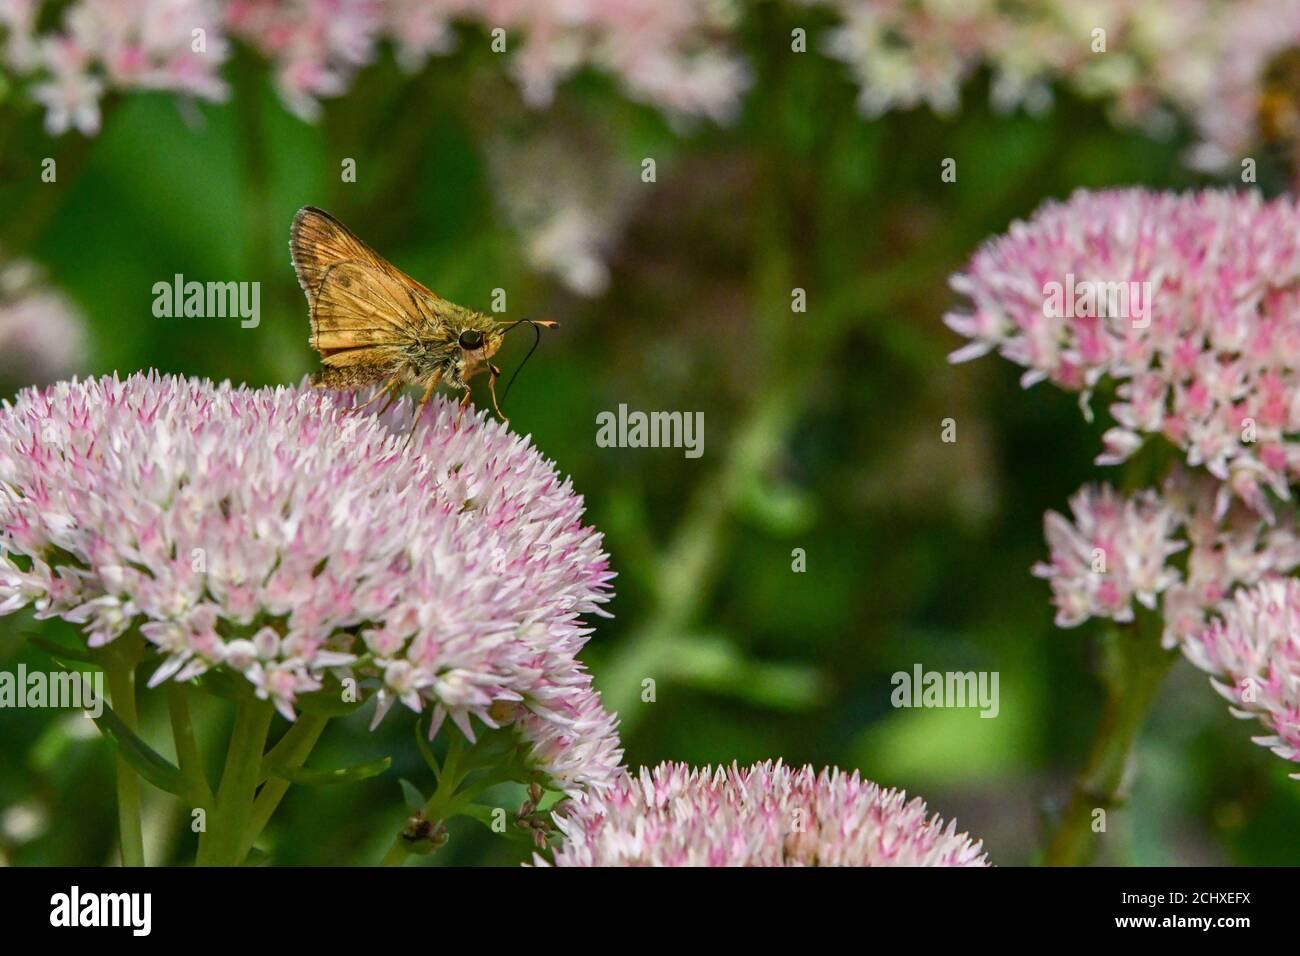 Mariposa de patrón - Hesperiidae - en otoño Joy sedum - Hylotelephium - mariposas diurnas sobre crassulacceae - Papilionoidea Foto de stock